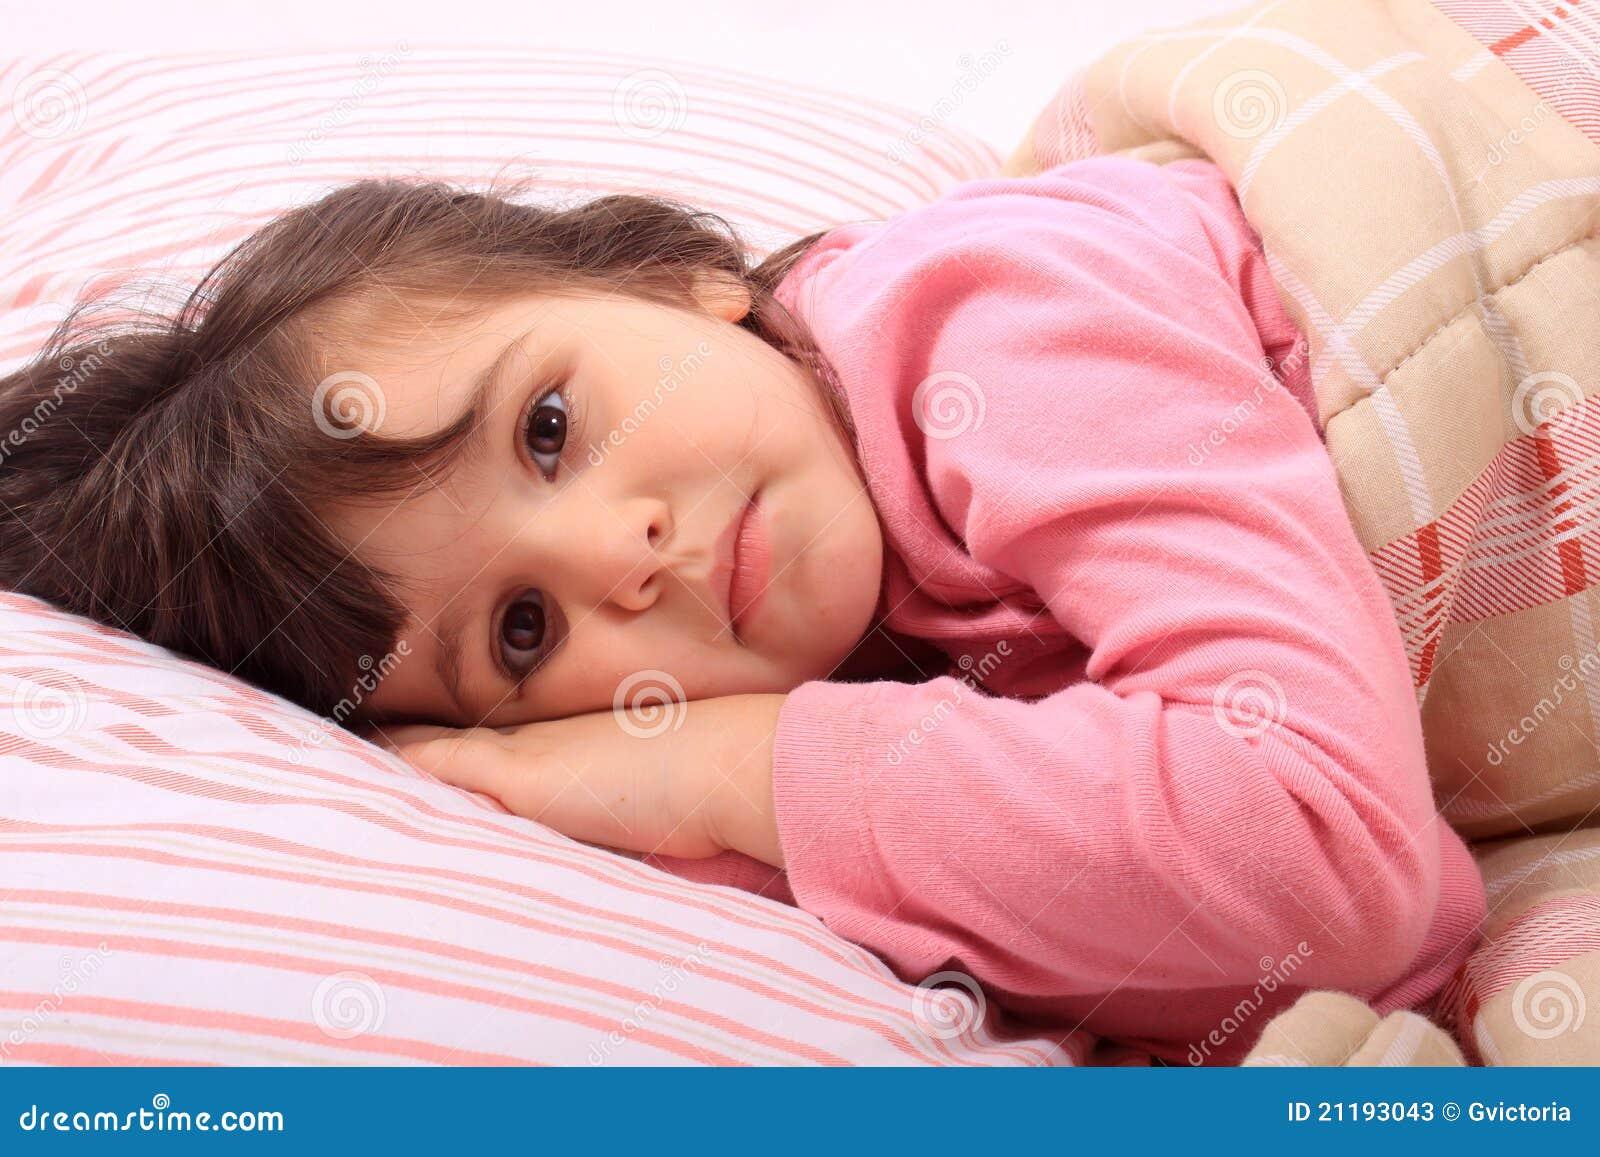 little girl bedtime stock photos image 21193043. Black Bedroom Furniture Sets. Home Design Ideas